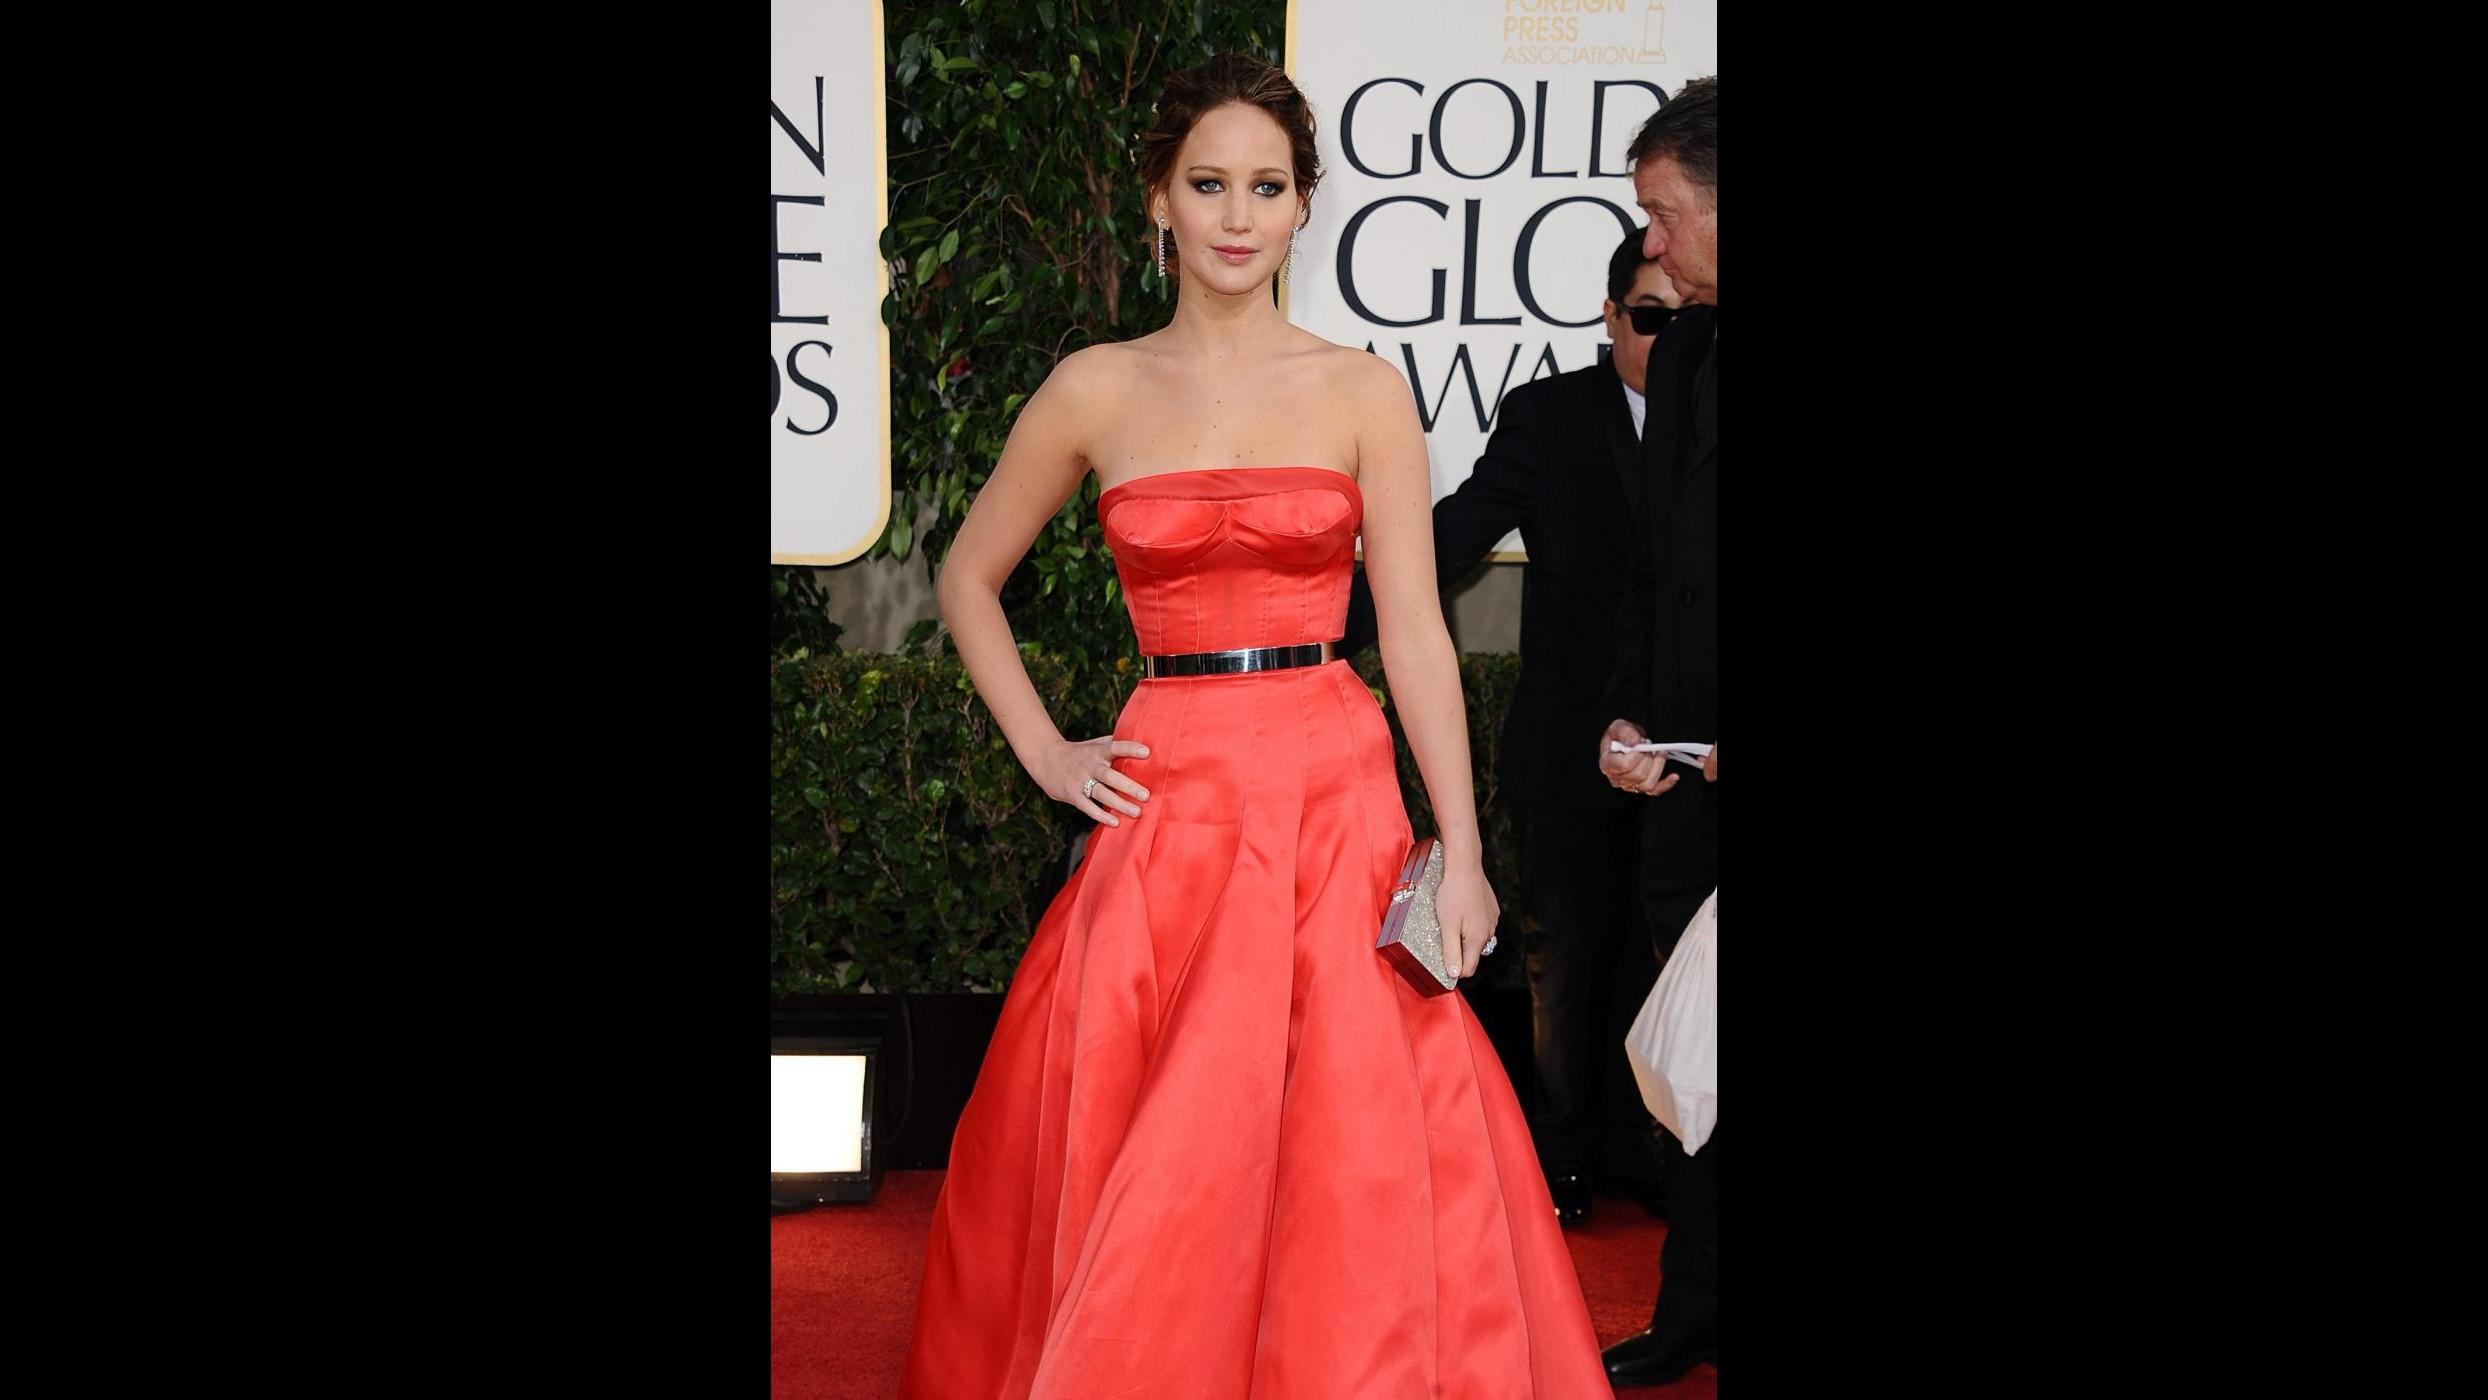 Golden Globe, Lawrence e Cotillard, due gemelle in rosso Dior